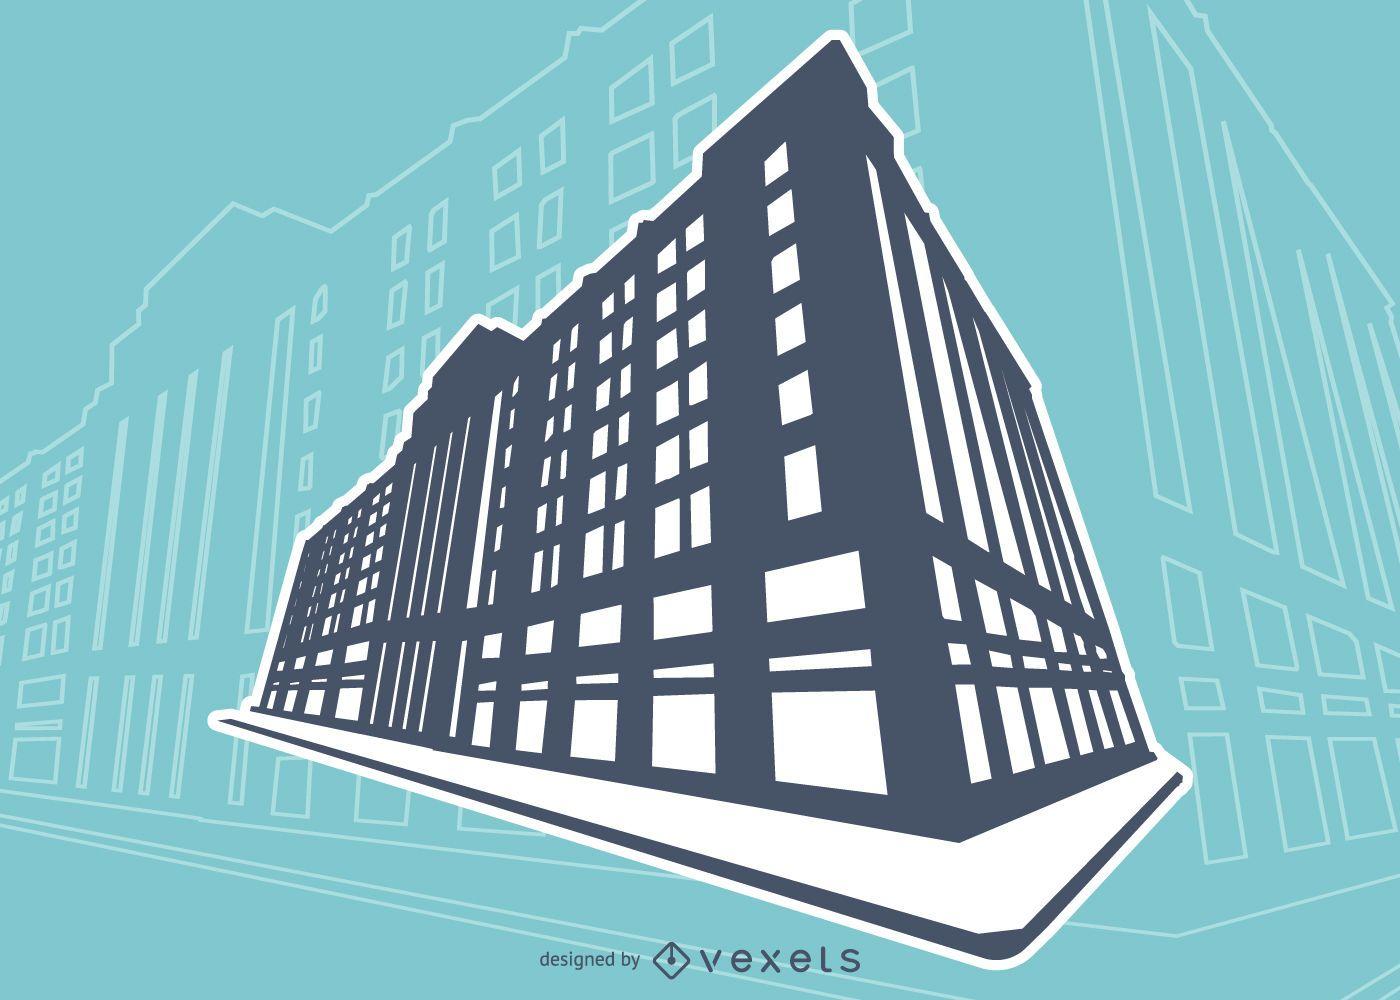 Building Silhouette Illustration